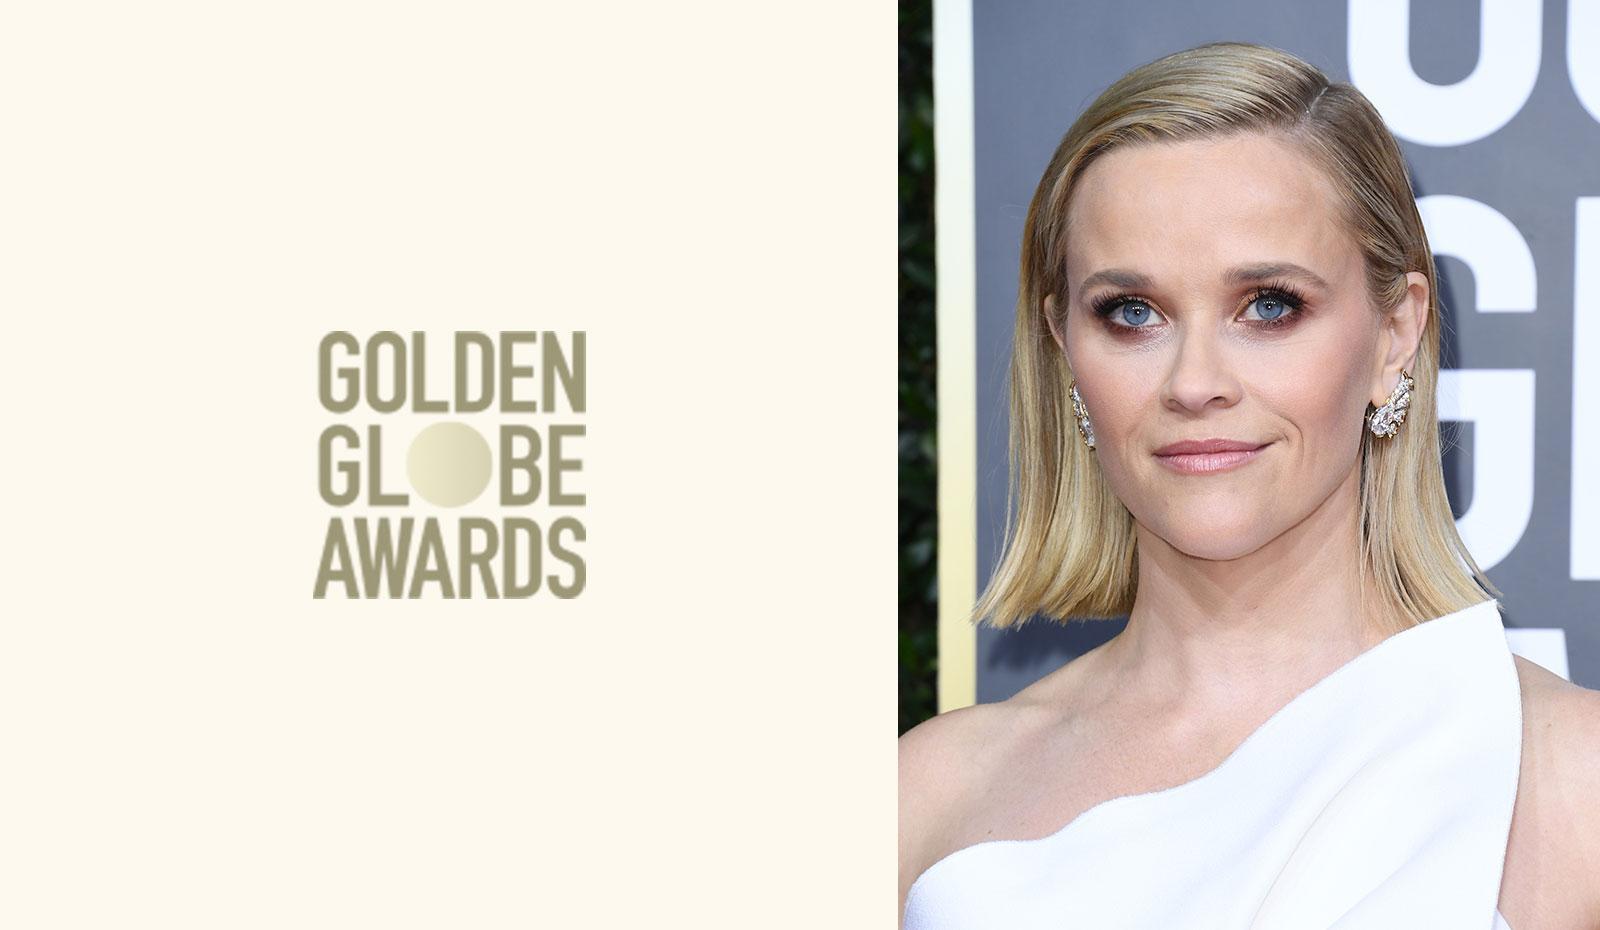 2020 Golden Globes: Reese Witherspoon's Sleek Modern Bob